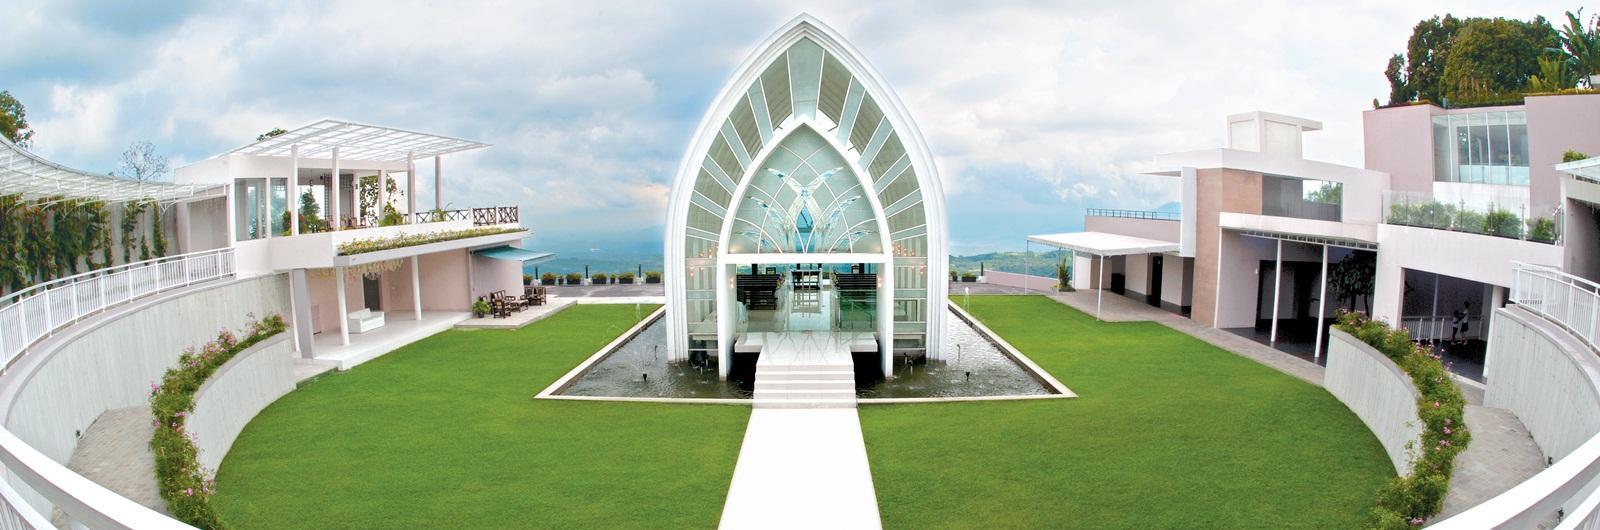 Susan Spa & Resort (La Kana) Semarang